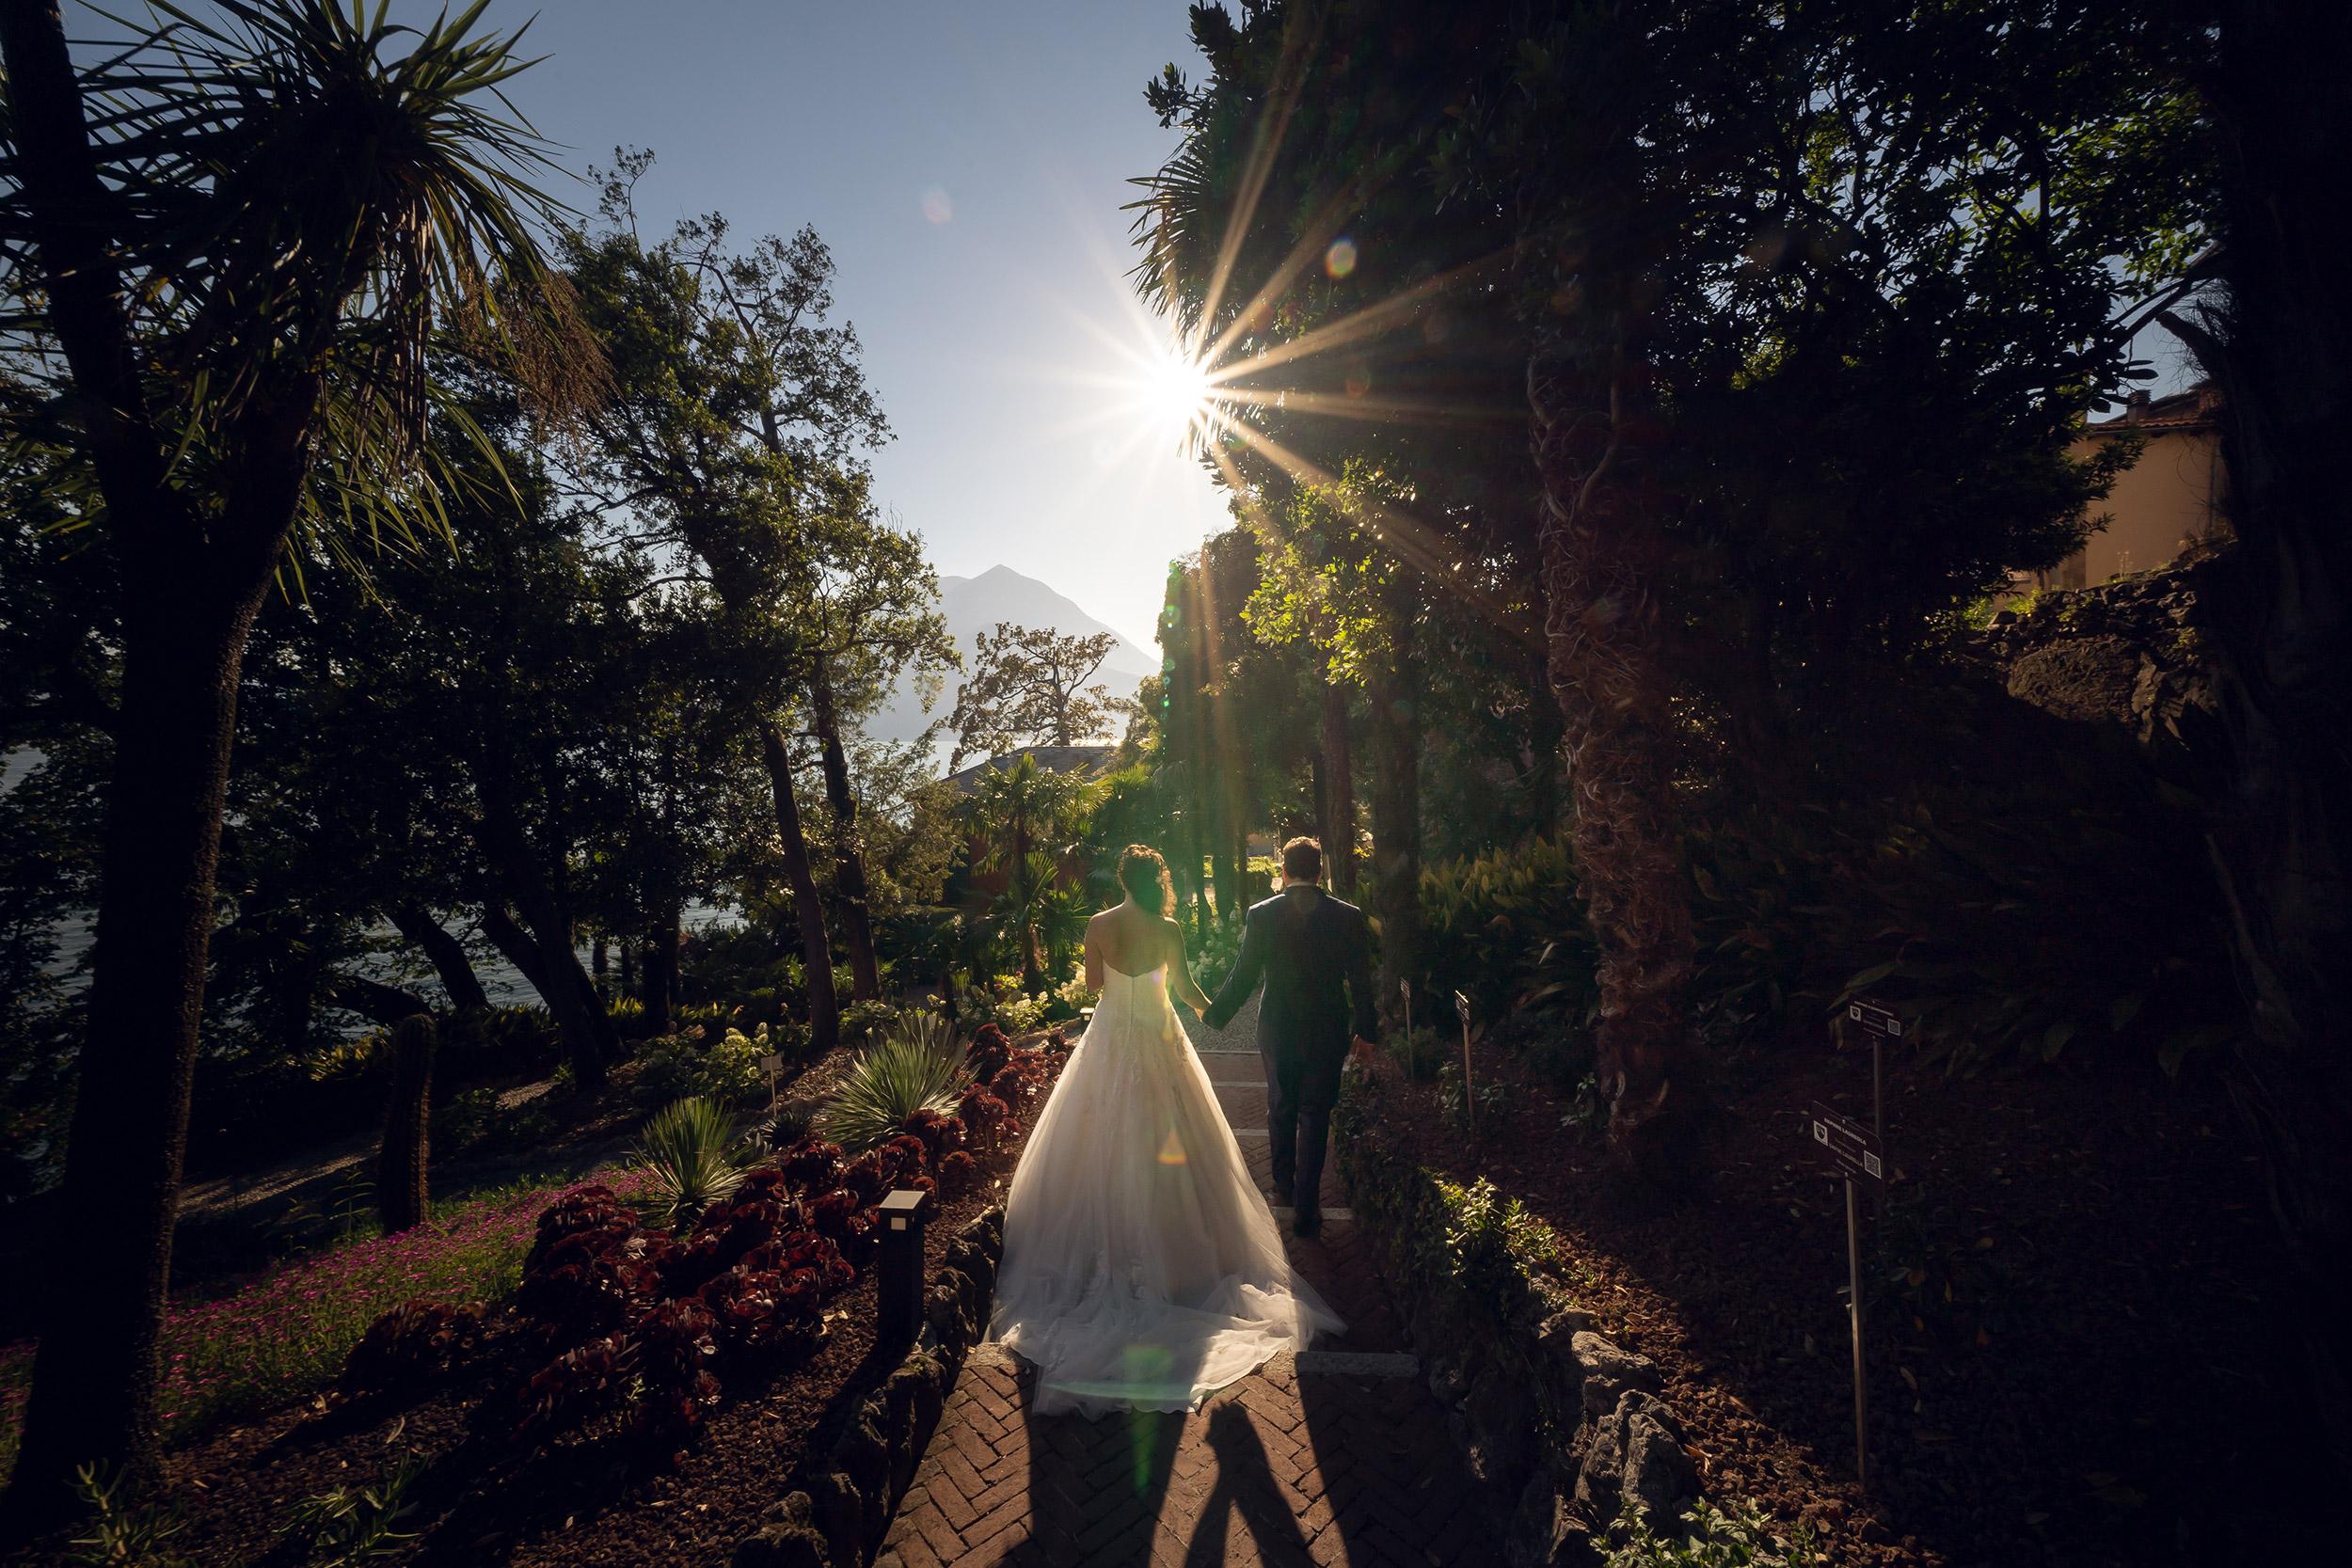 000 reportage sposi foto matrimonio wedding villa cipressi varenna lecco lago como 1